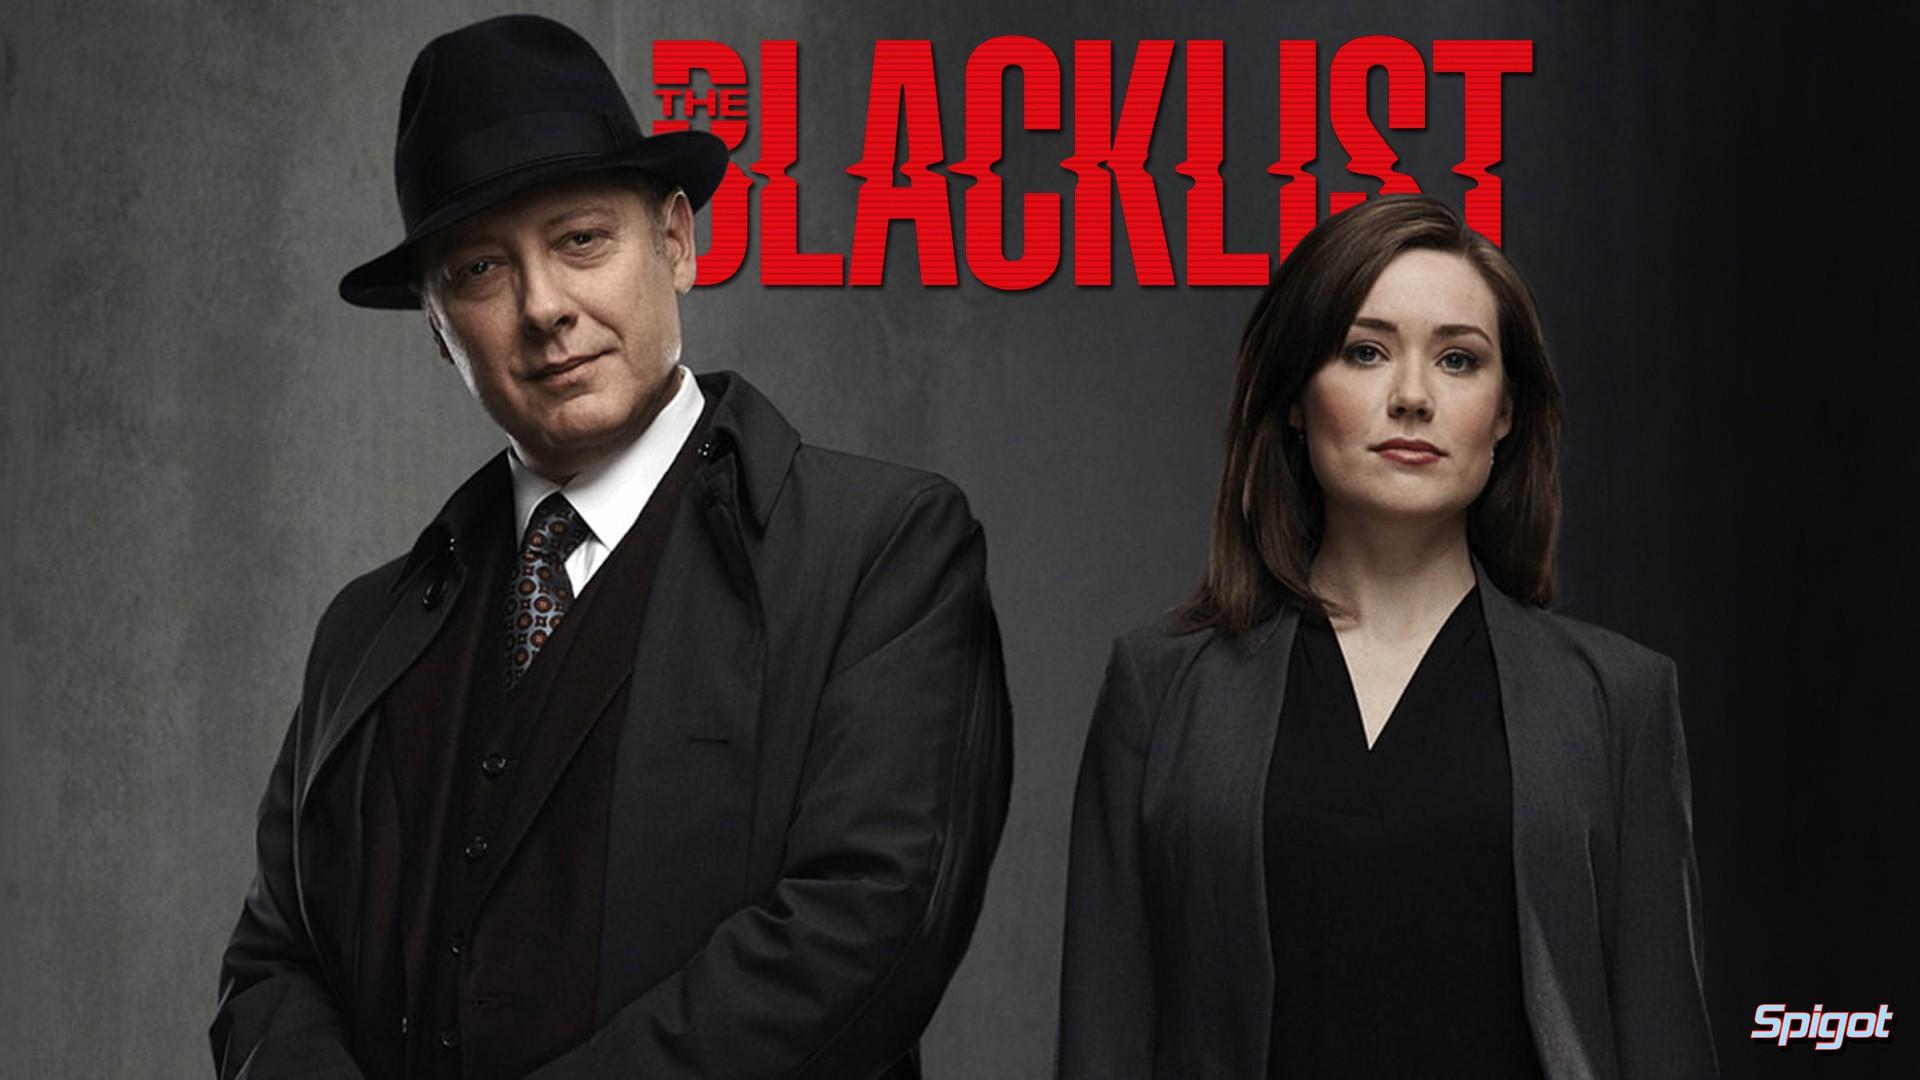 The Blacklist 7. sezon ne zaman Netflix'e gelecek?